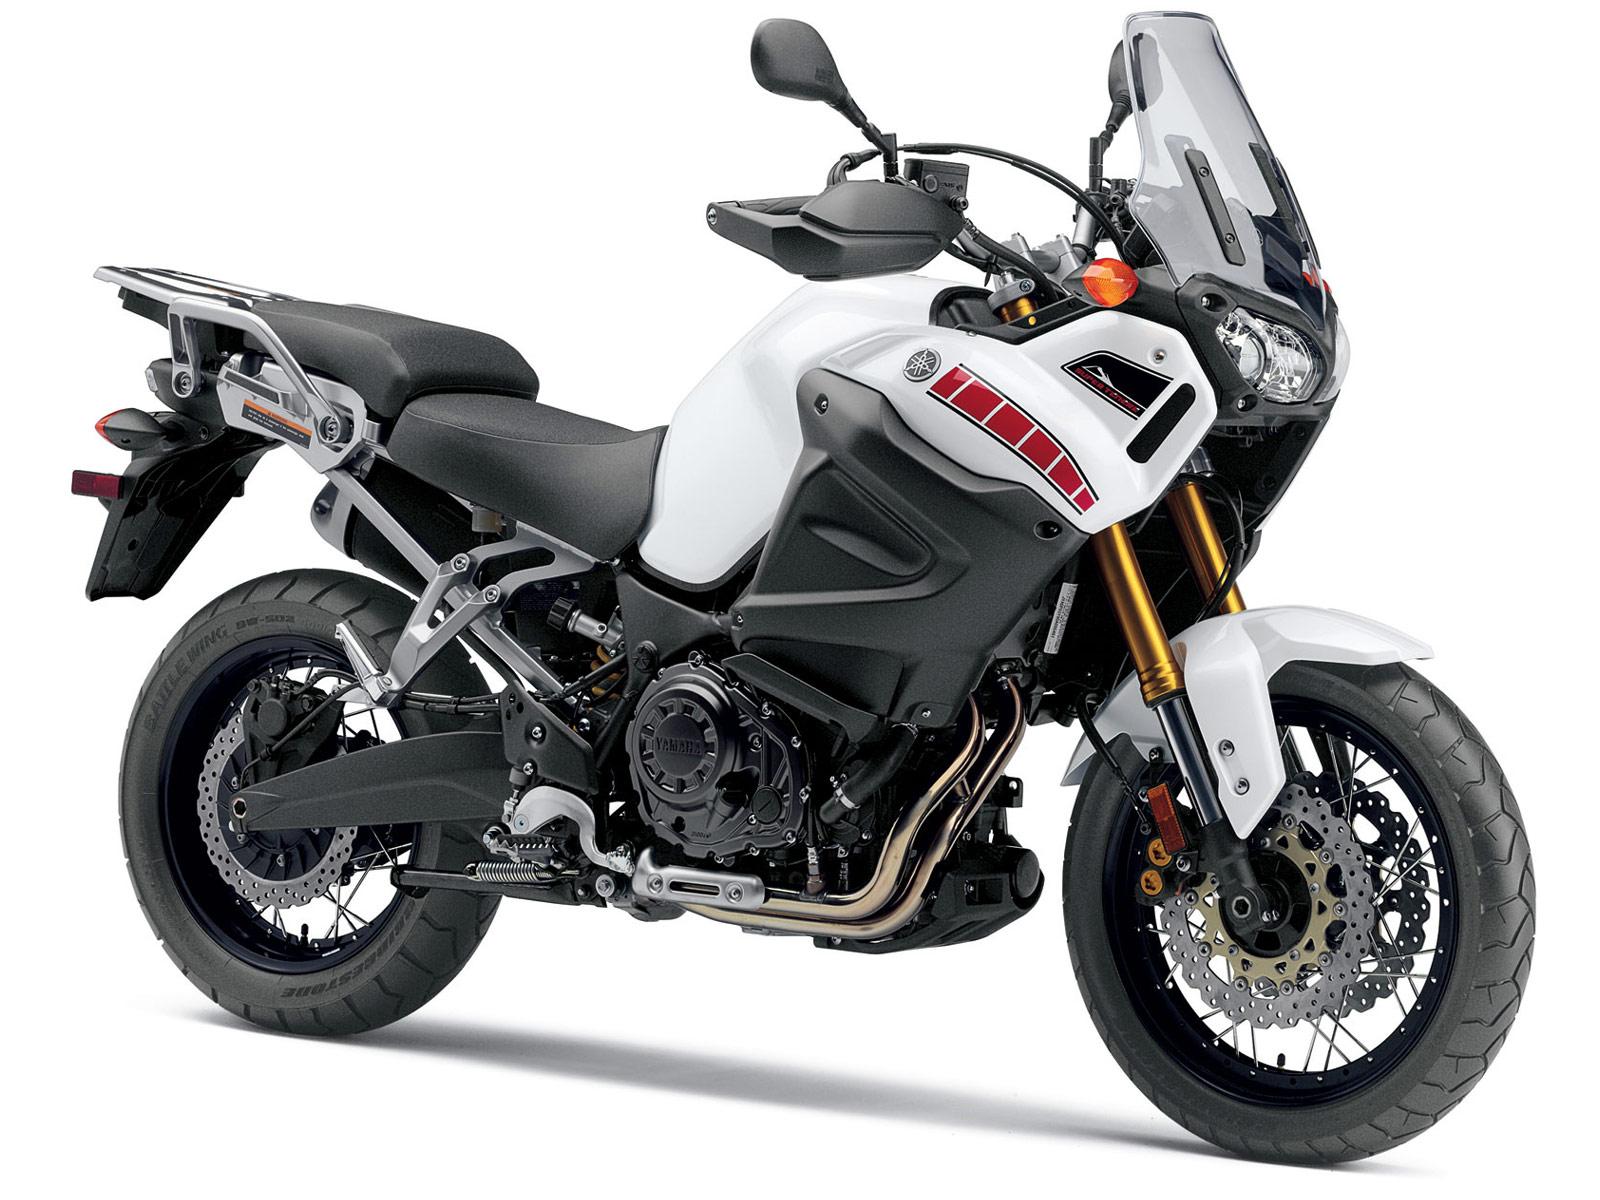 Yamaha Super Tenere Seat Height